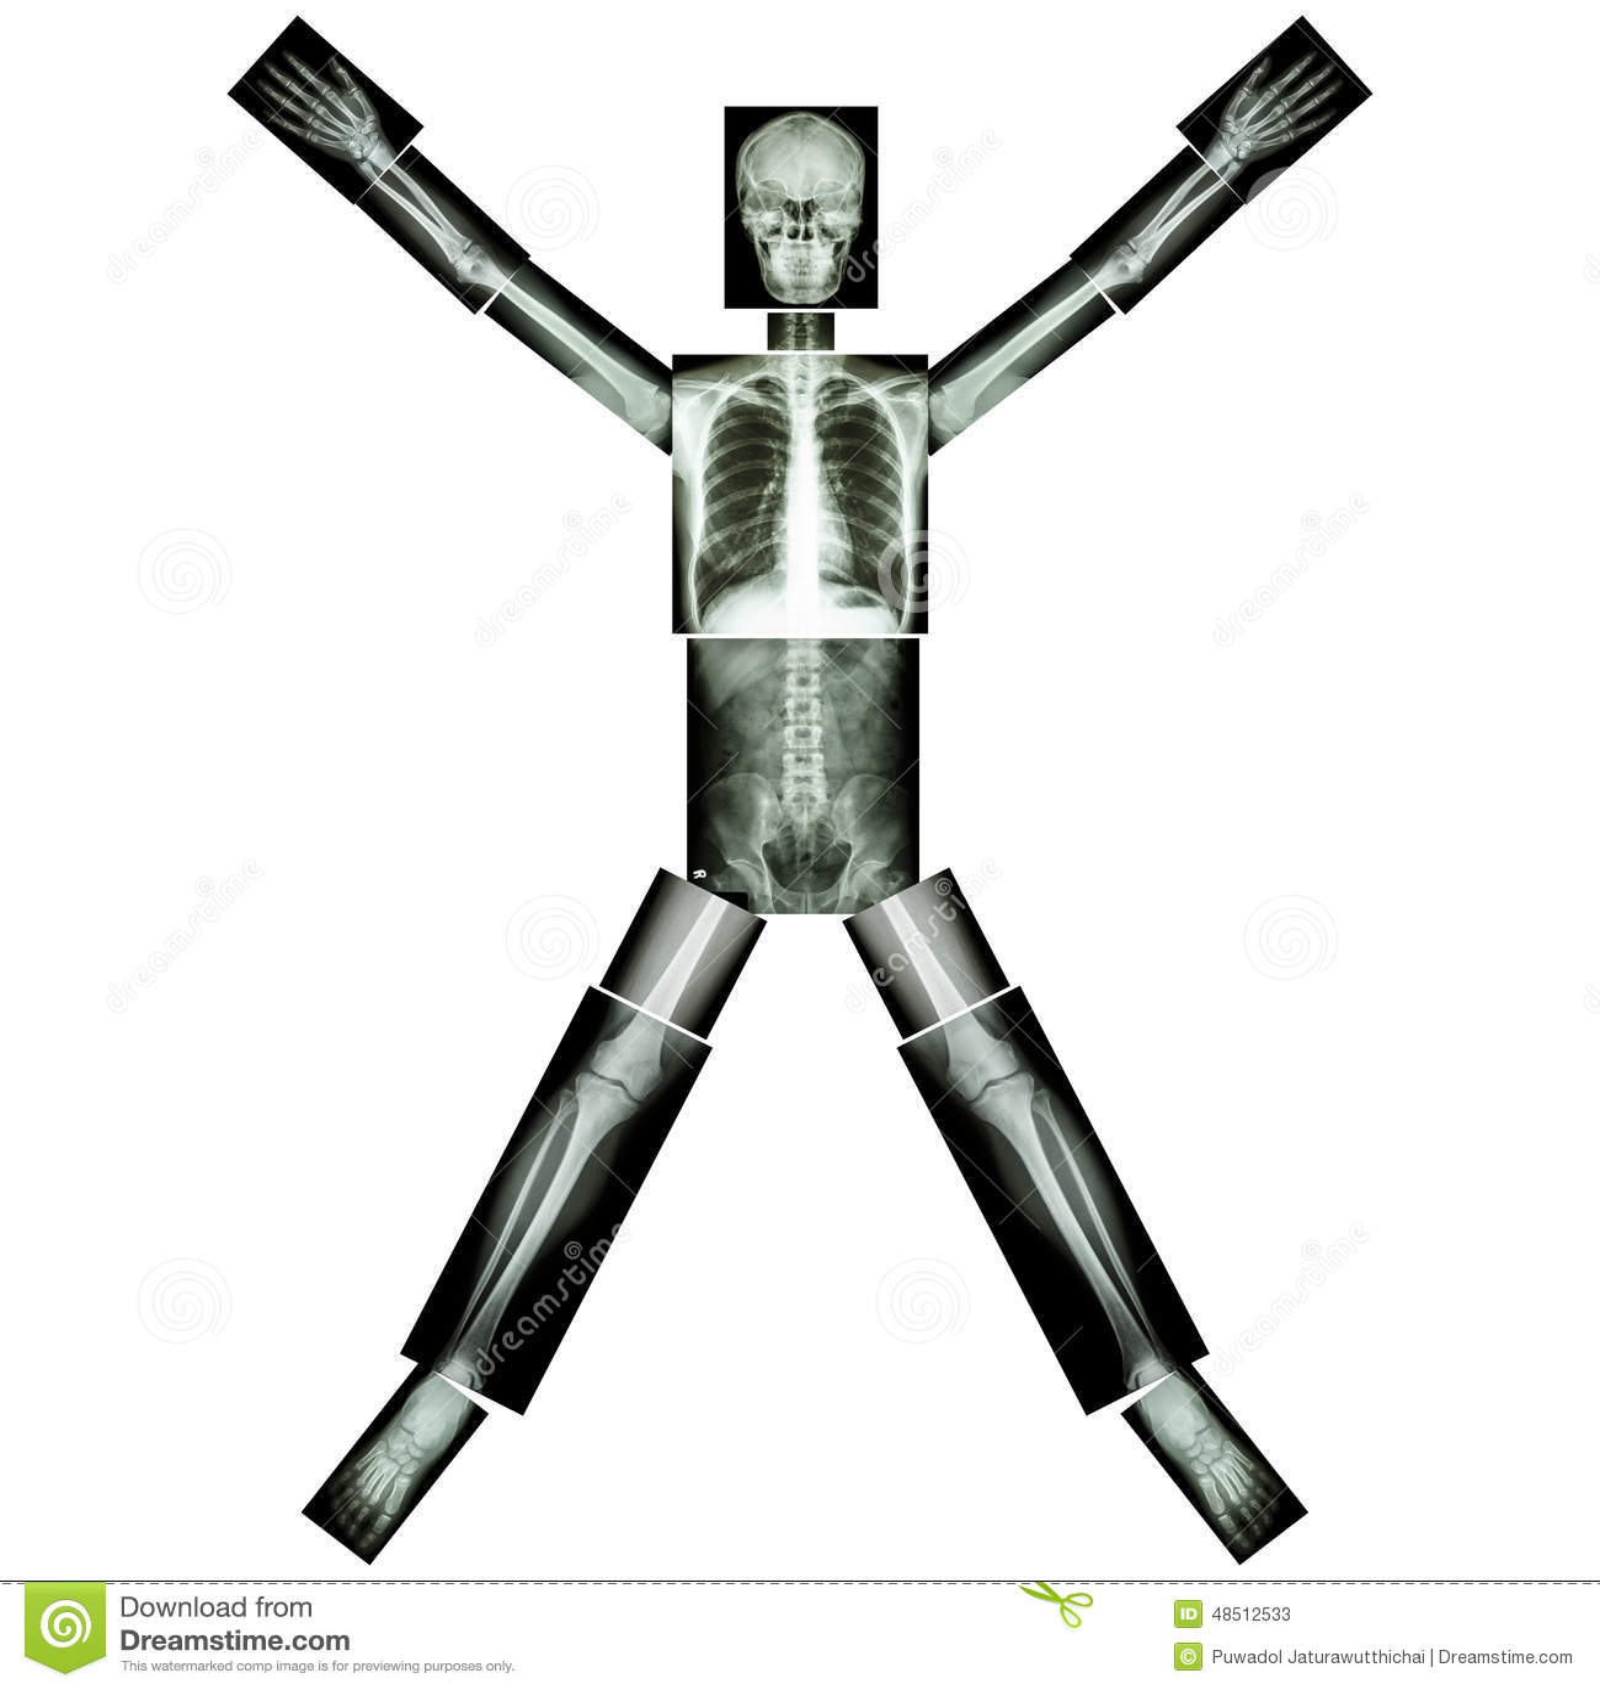 Os du corps humain carabiens le forum for Interieur du corps humain image